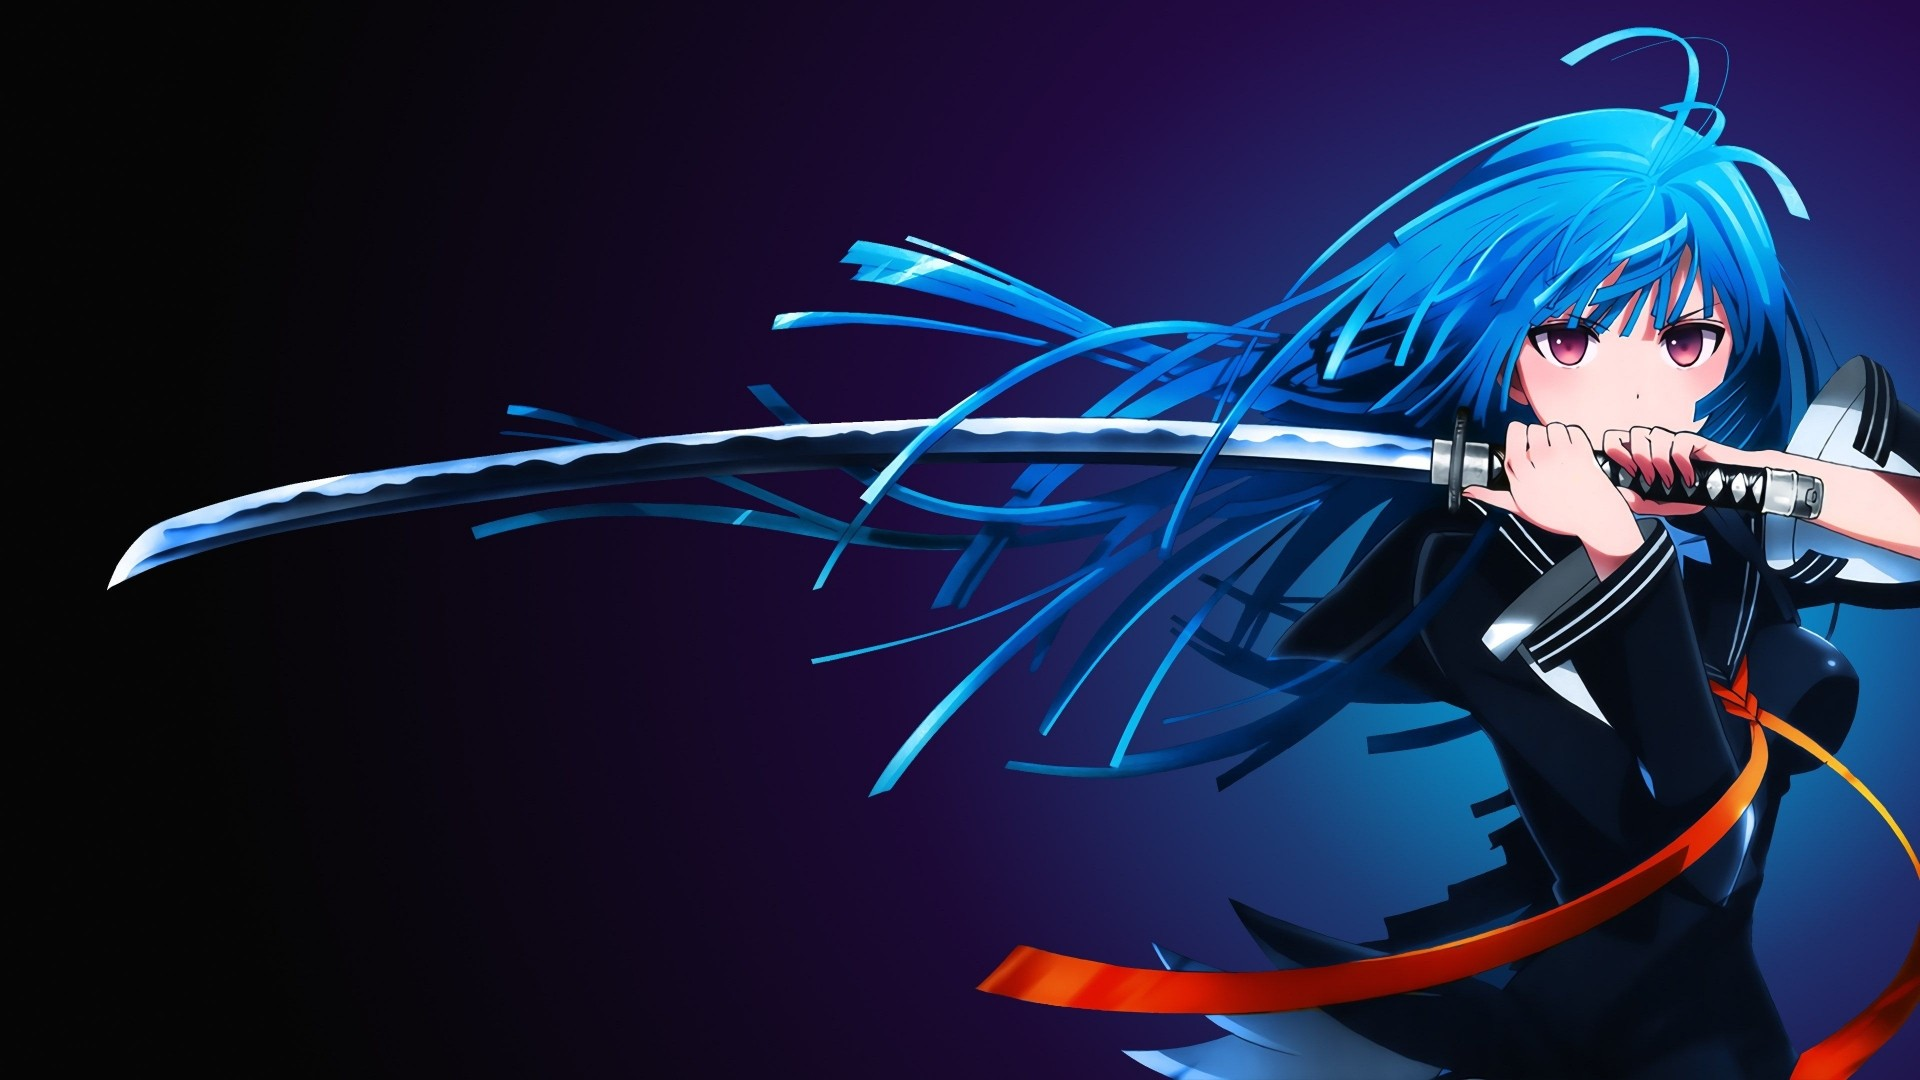 Manga Wallpaper Full HD